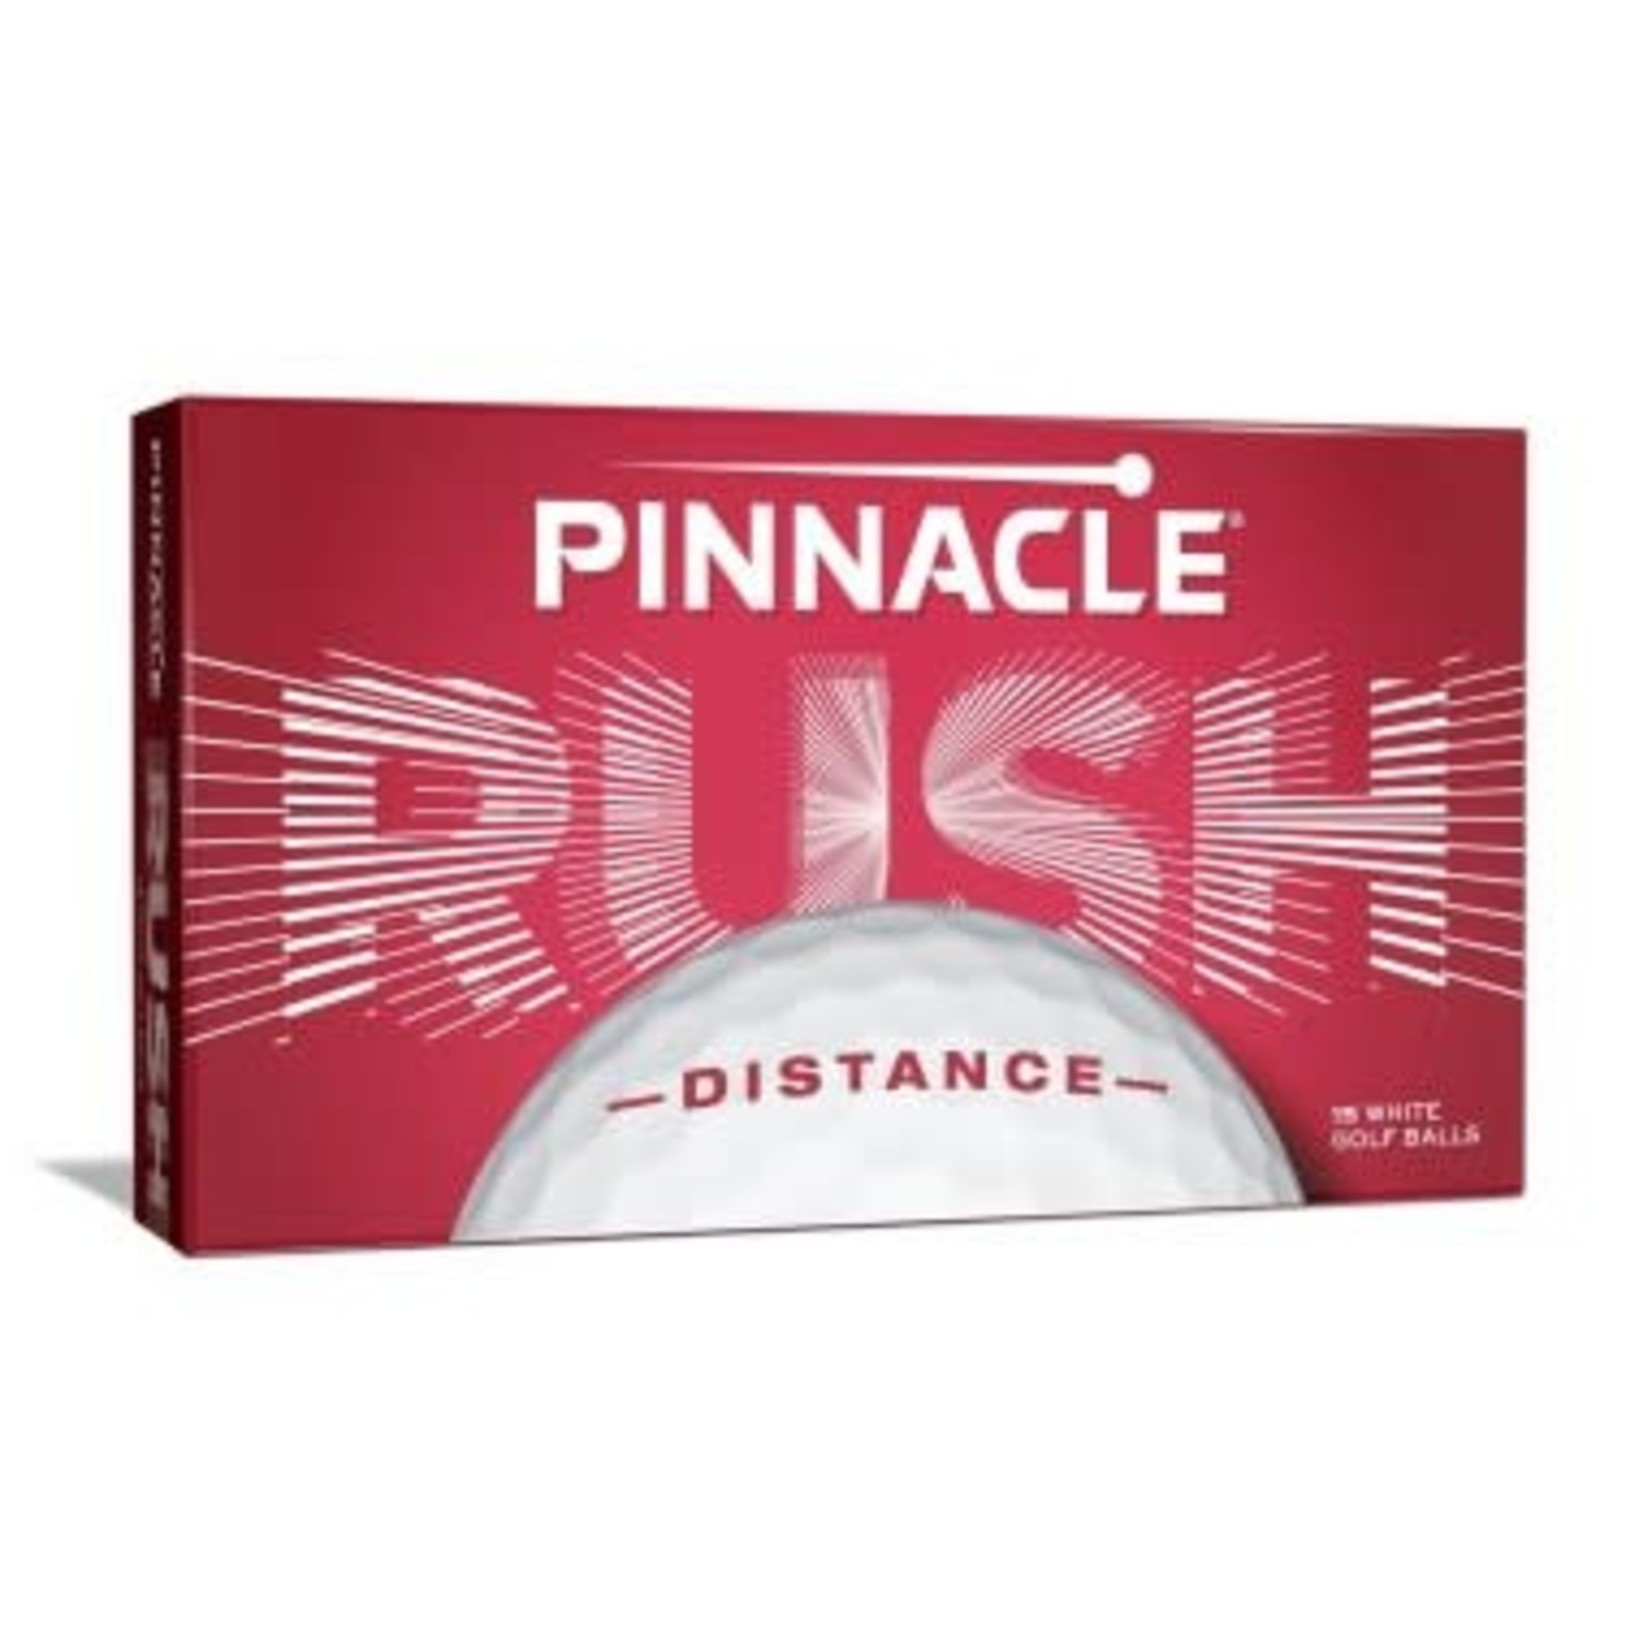 Pinnacle Pinnacle Rush White